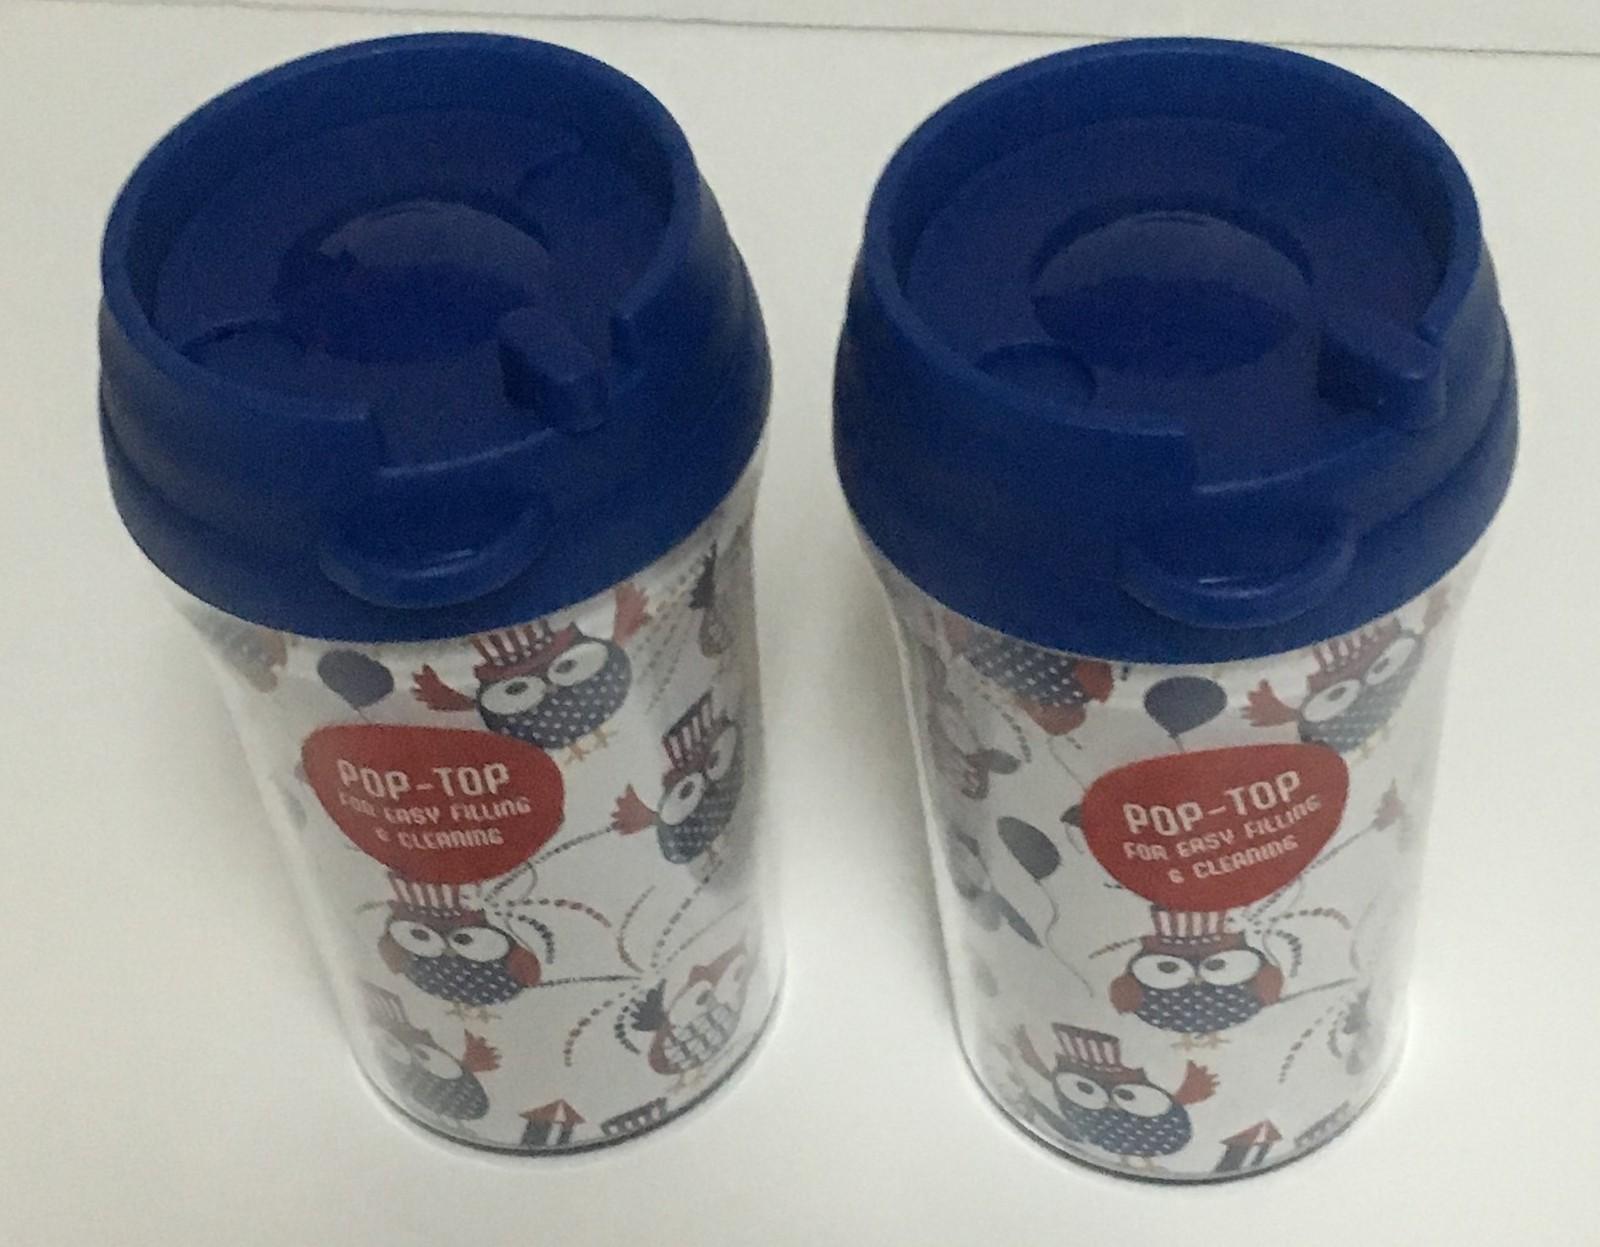 Patriotic Owl Design 10 Oz Travel Cups Pop Top Lot of 2